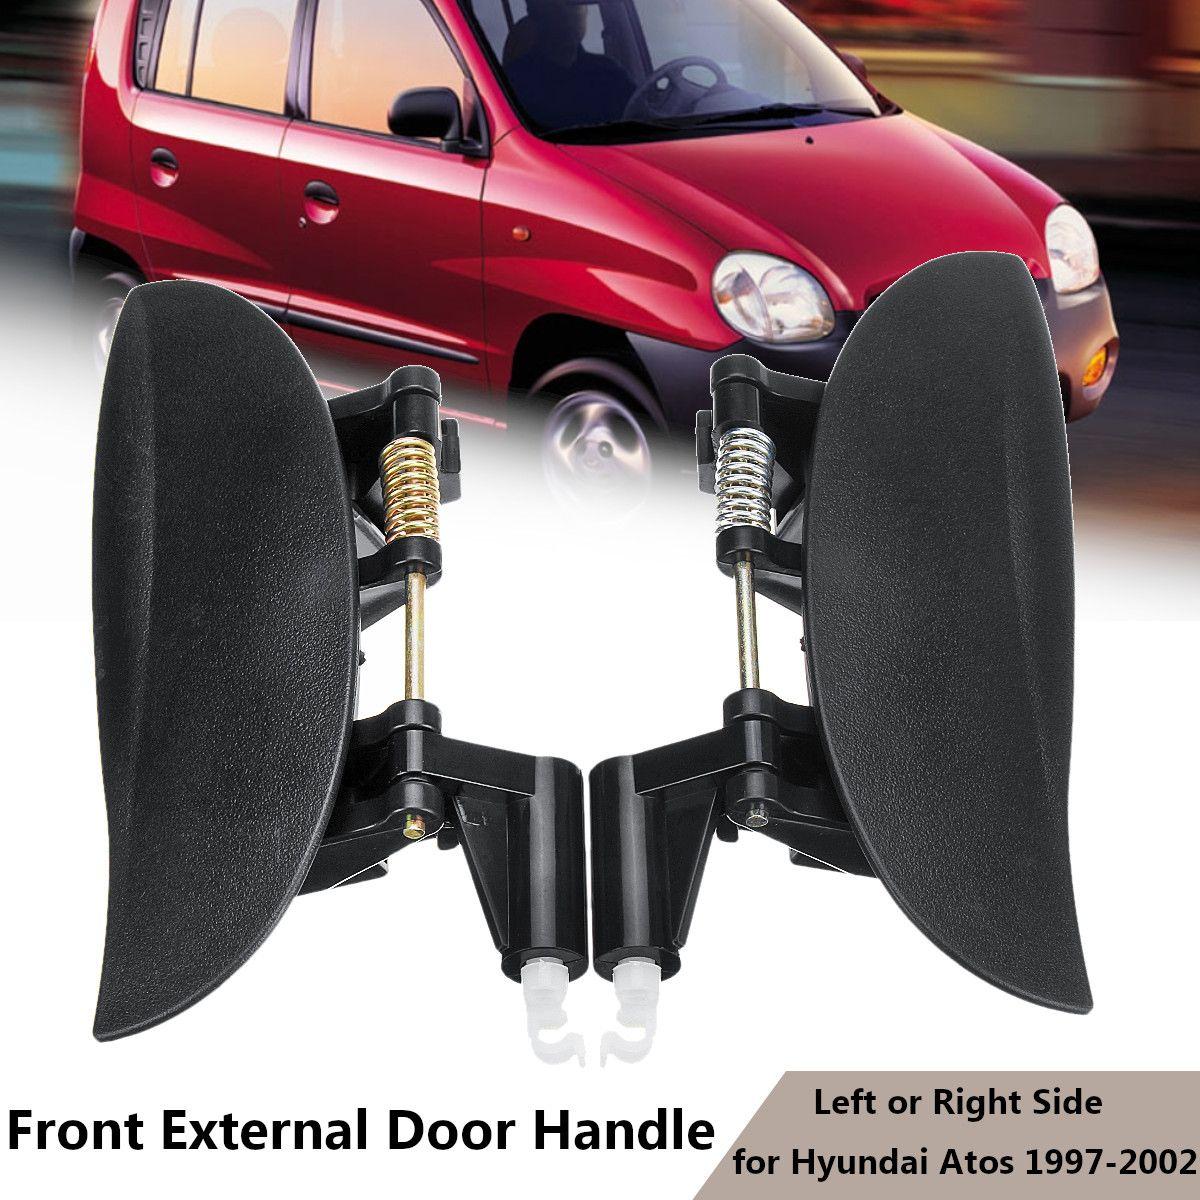 for MERCEDES VITO 2x EXTERIOR DOOR HANDLE LOCK SET FRONT LEFT RIGHT REAR 1 KEY